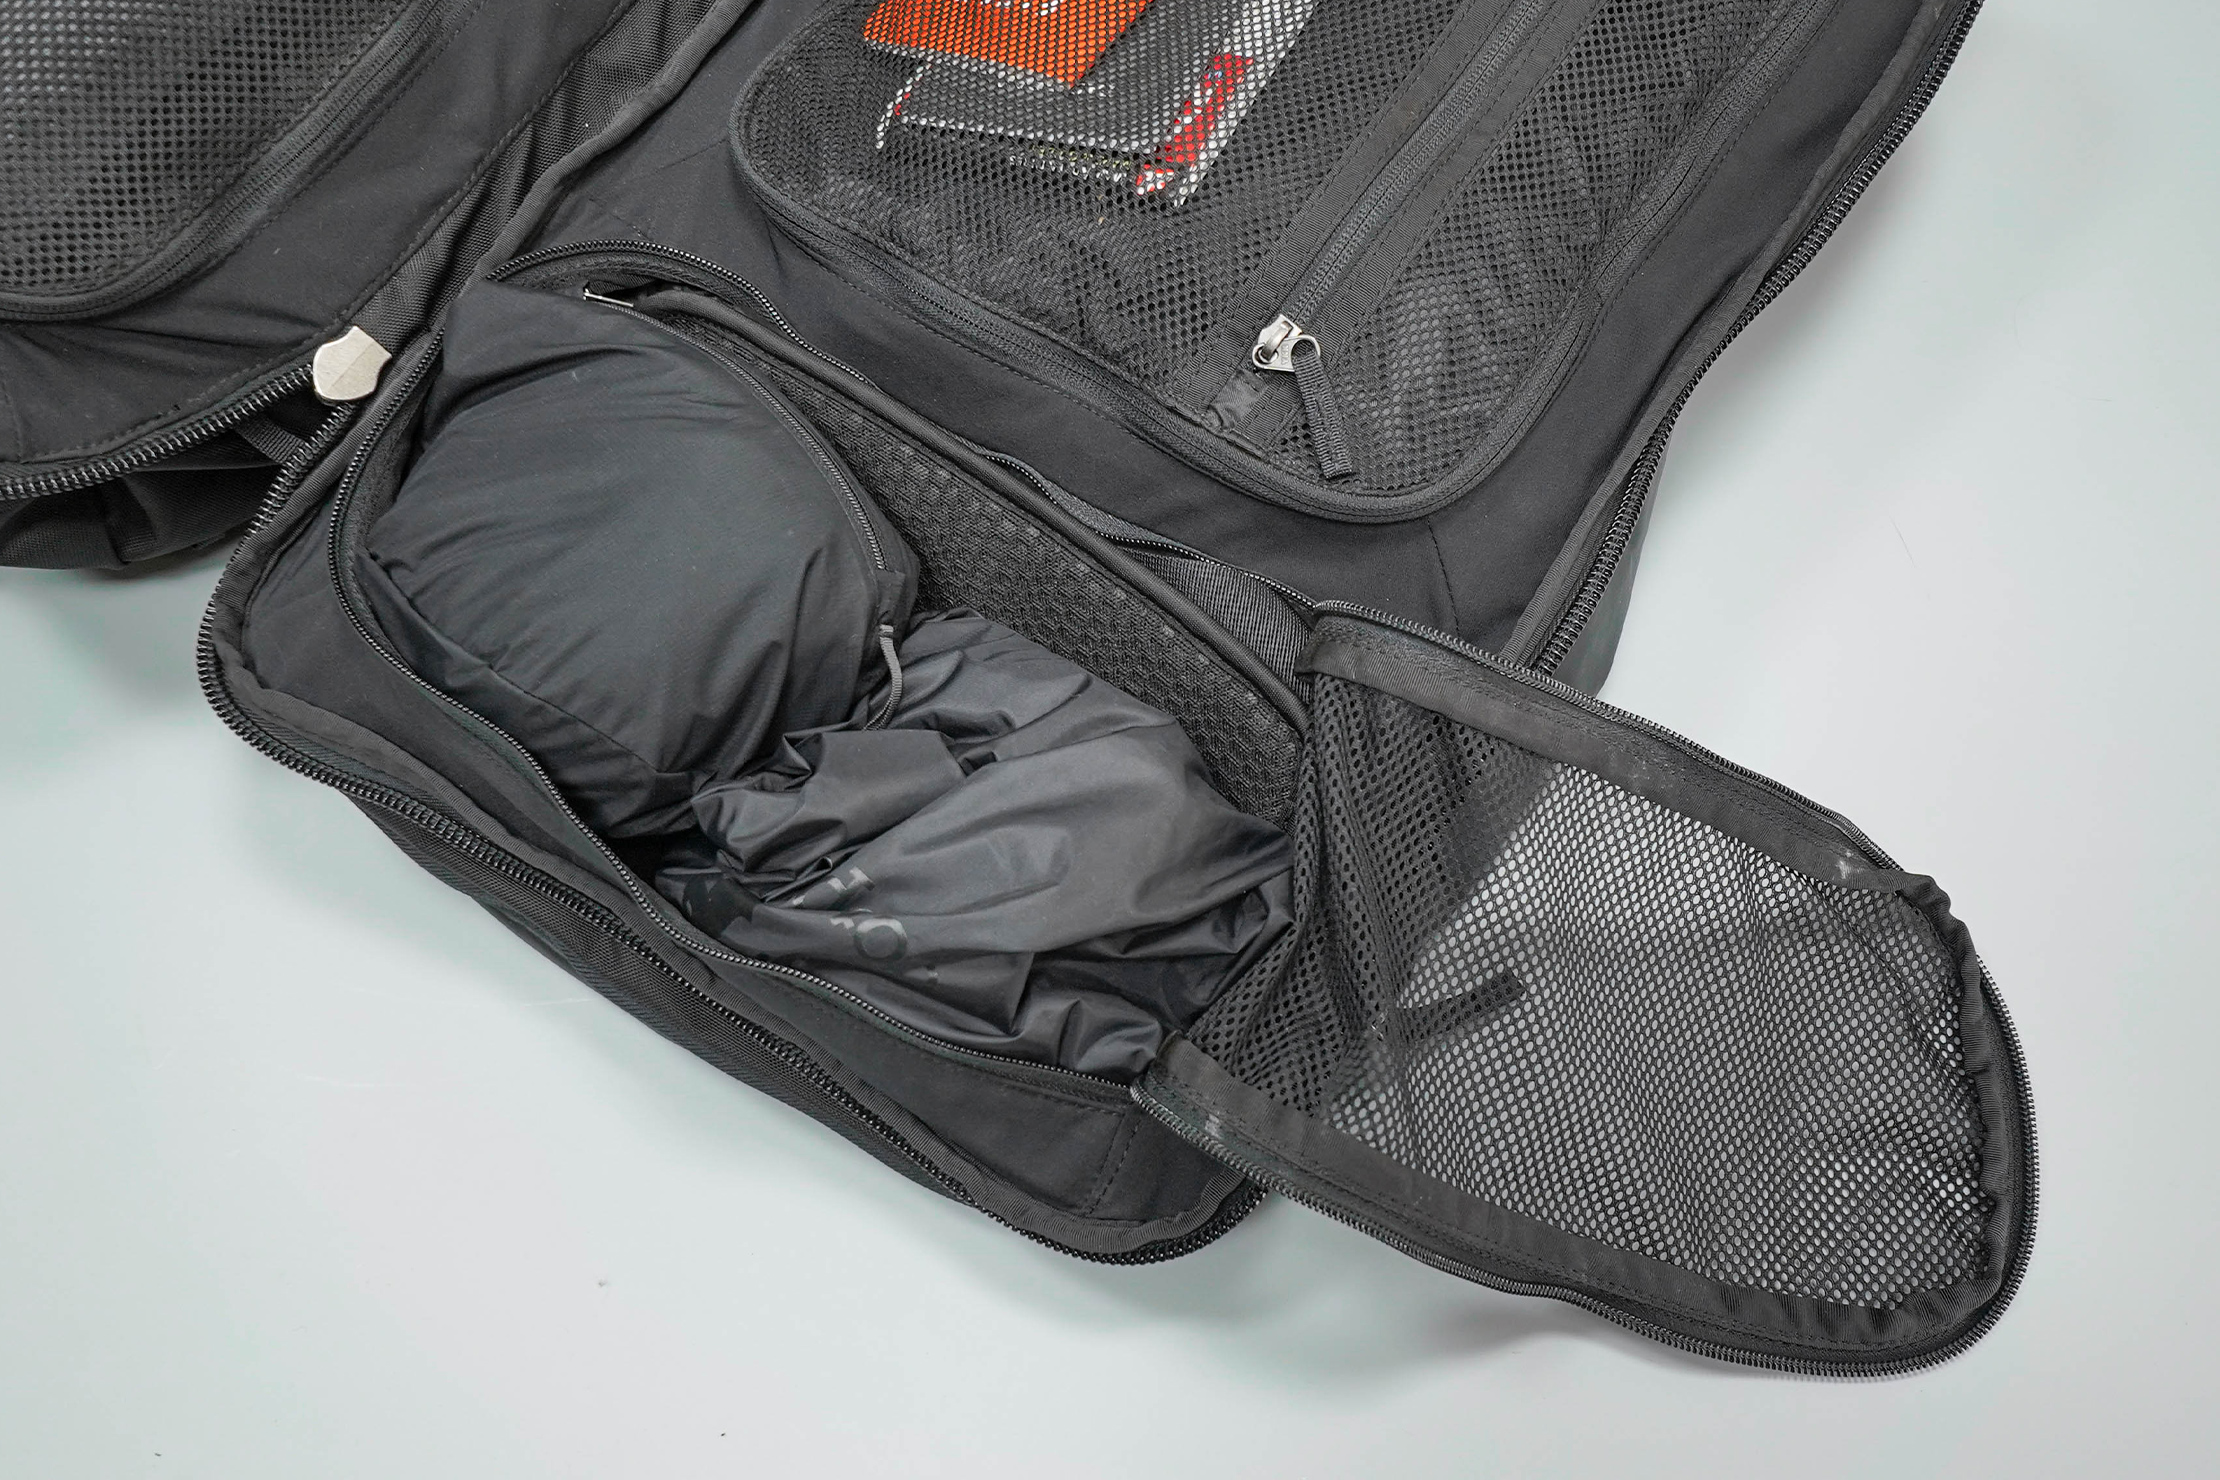 Cotopaxi Allpa 42L Main Compartment, Left Side Top Pocket